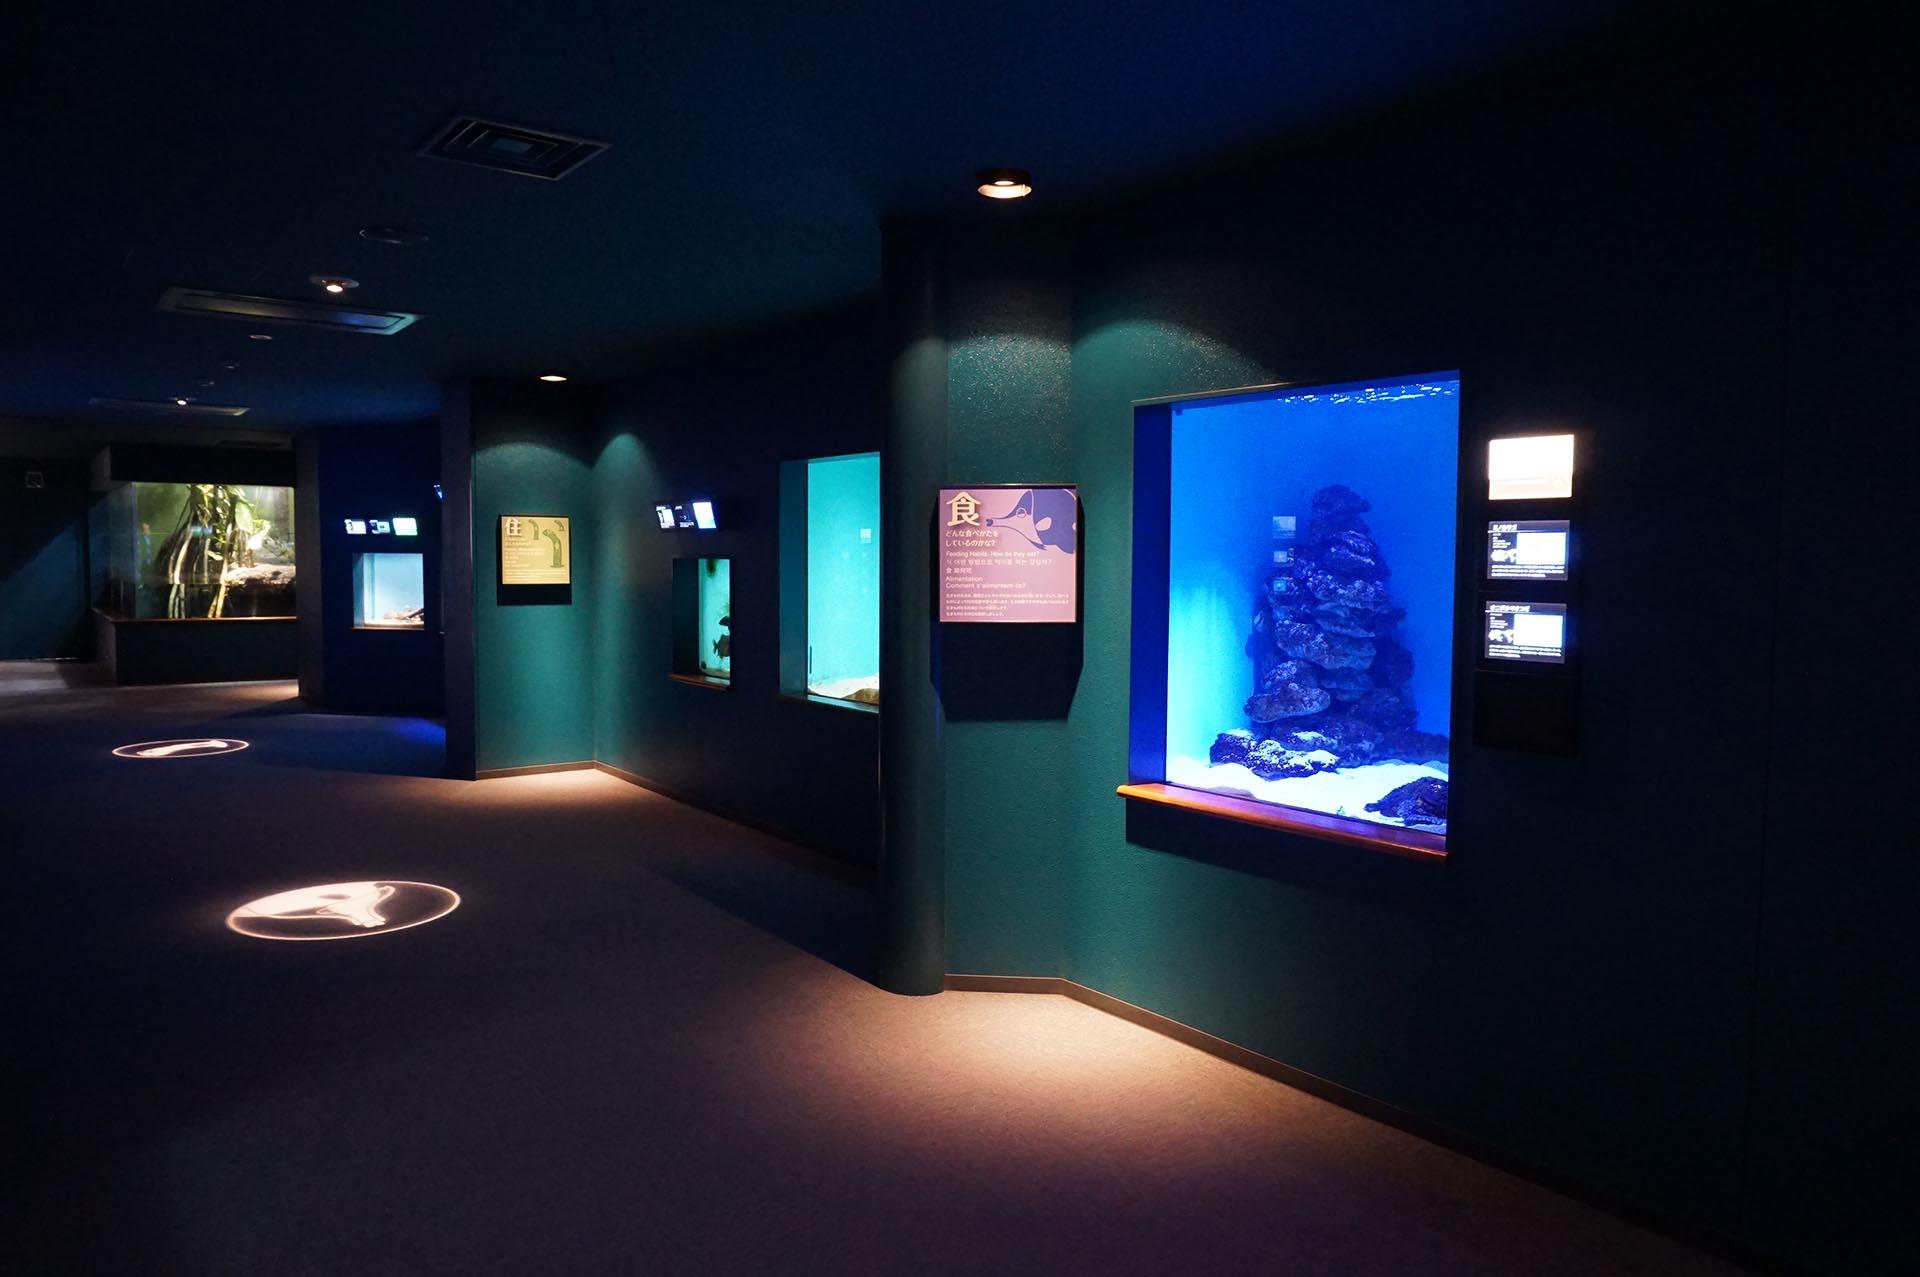 宮島水族館の館内